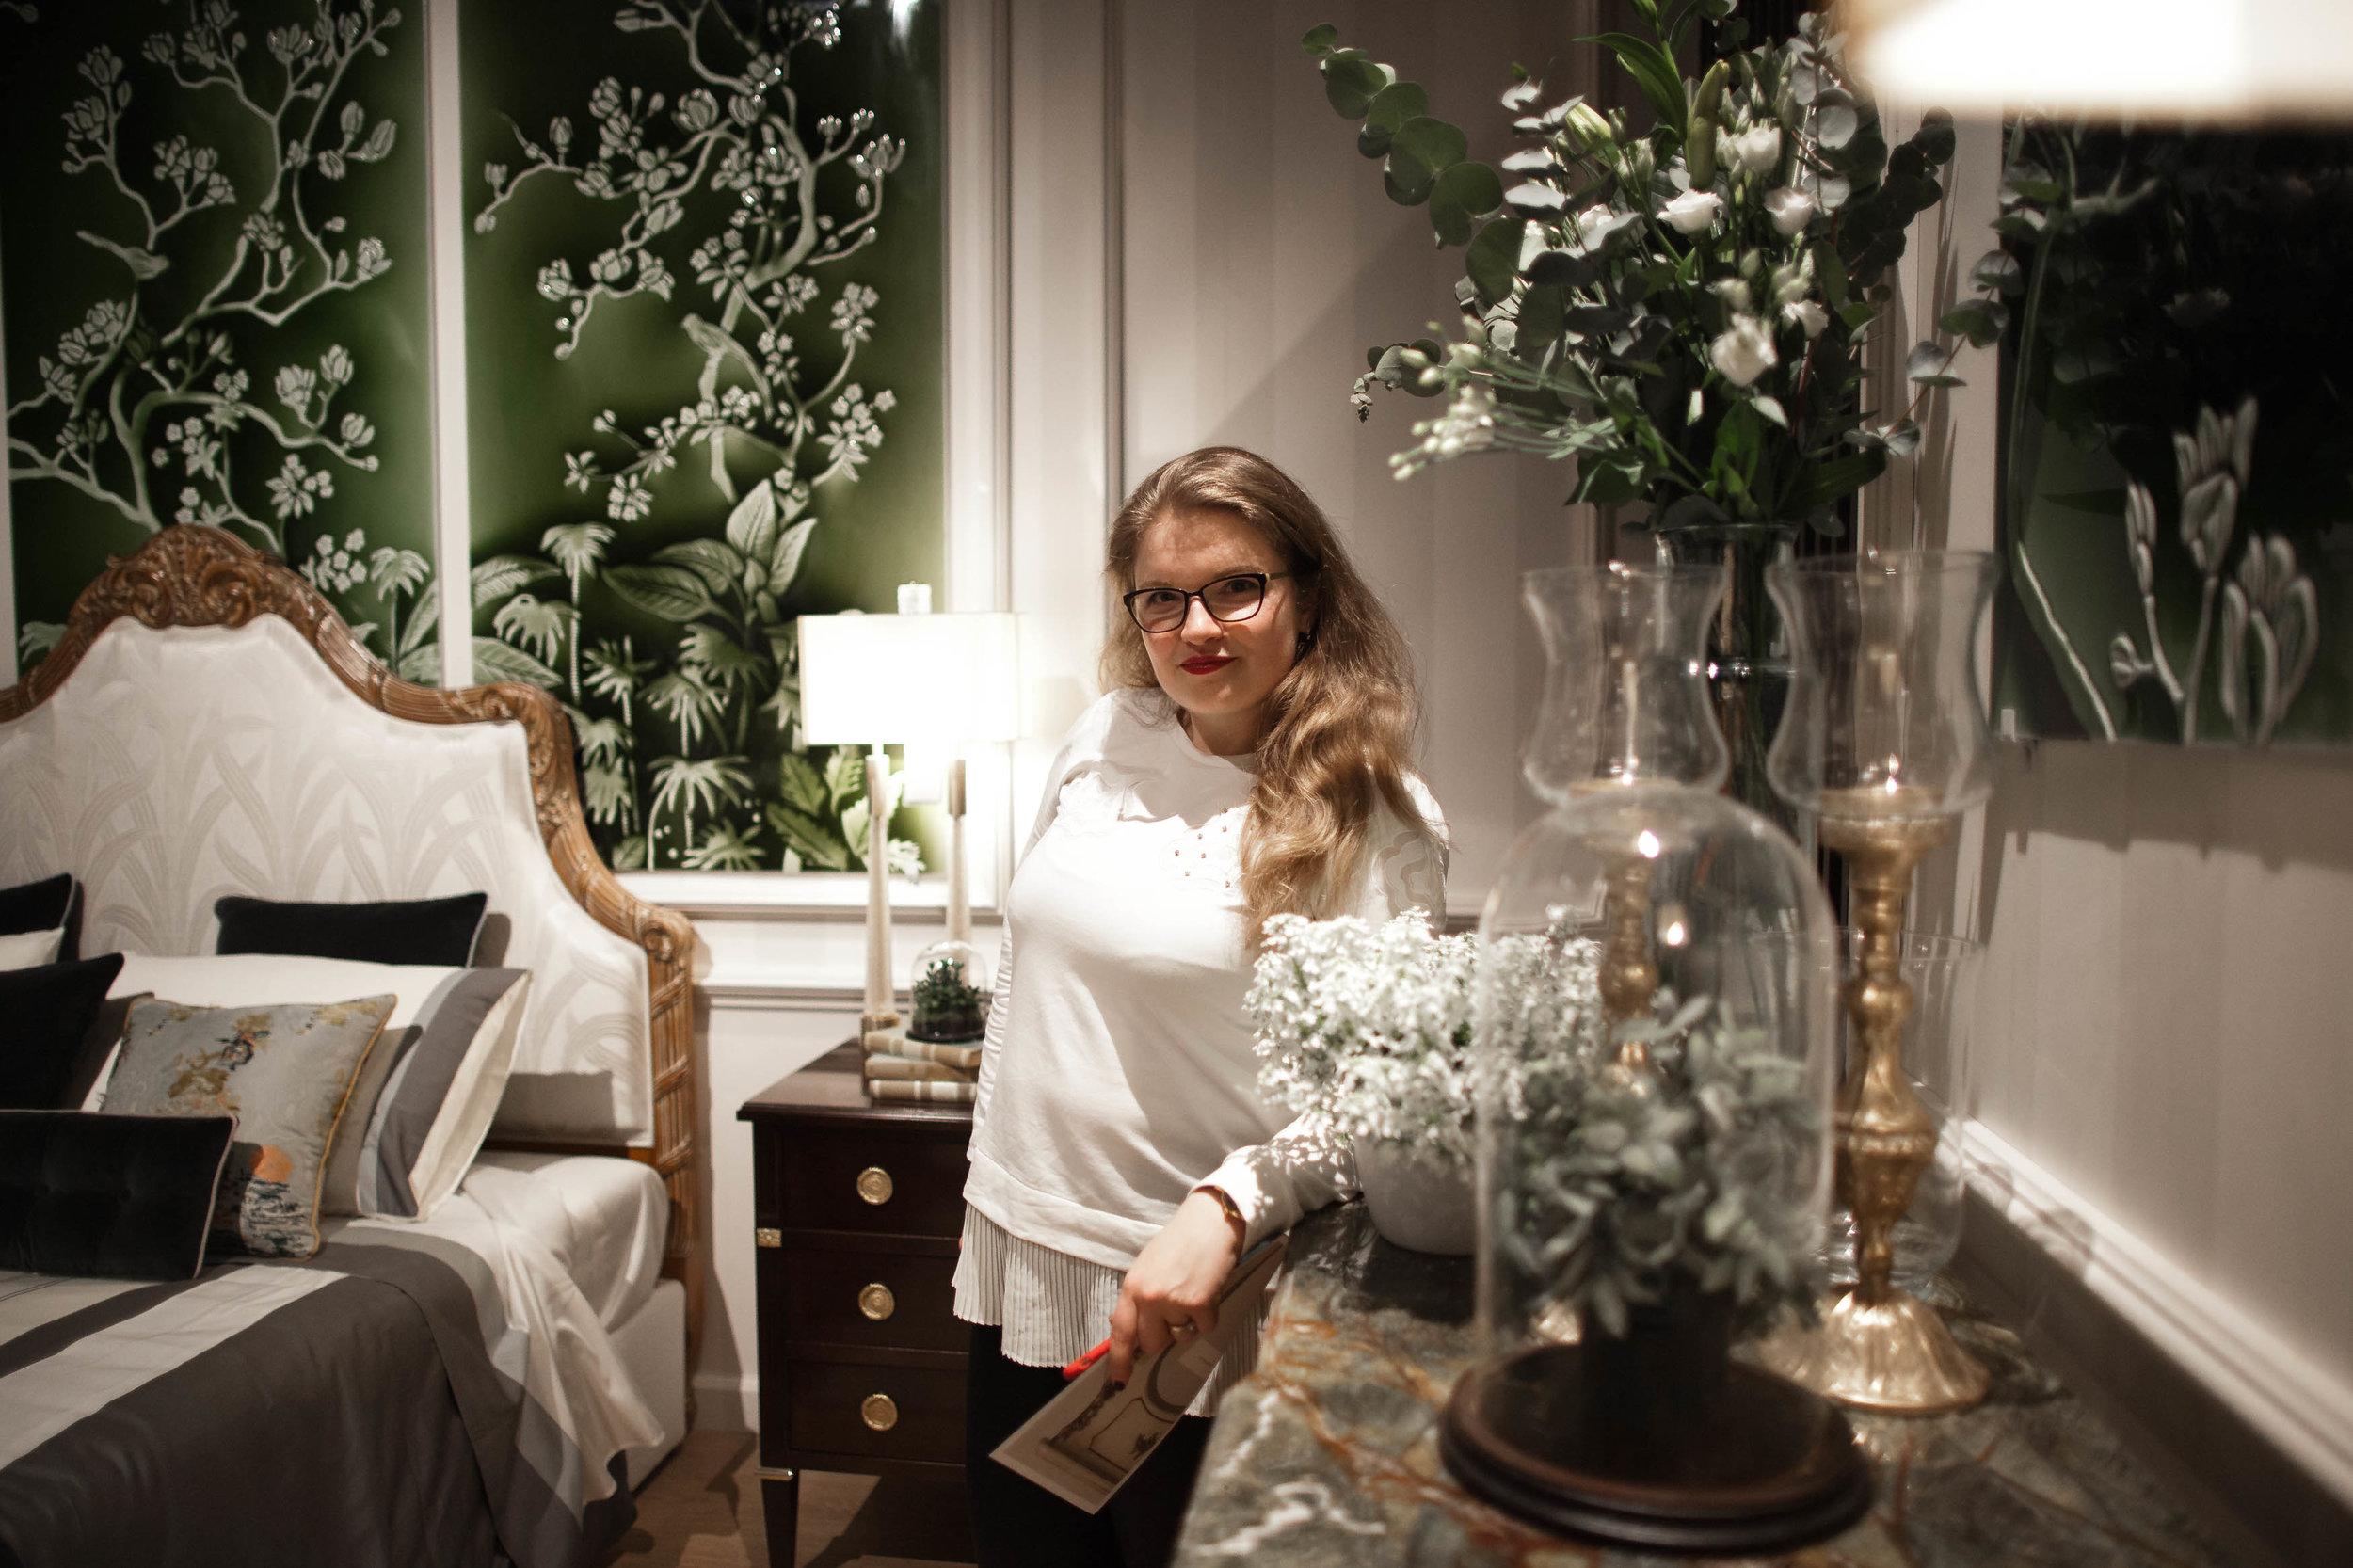 Masha Shapiro - • Business owner• UK agent• Brand ambassador